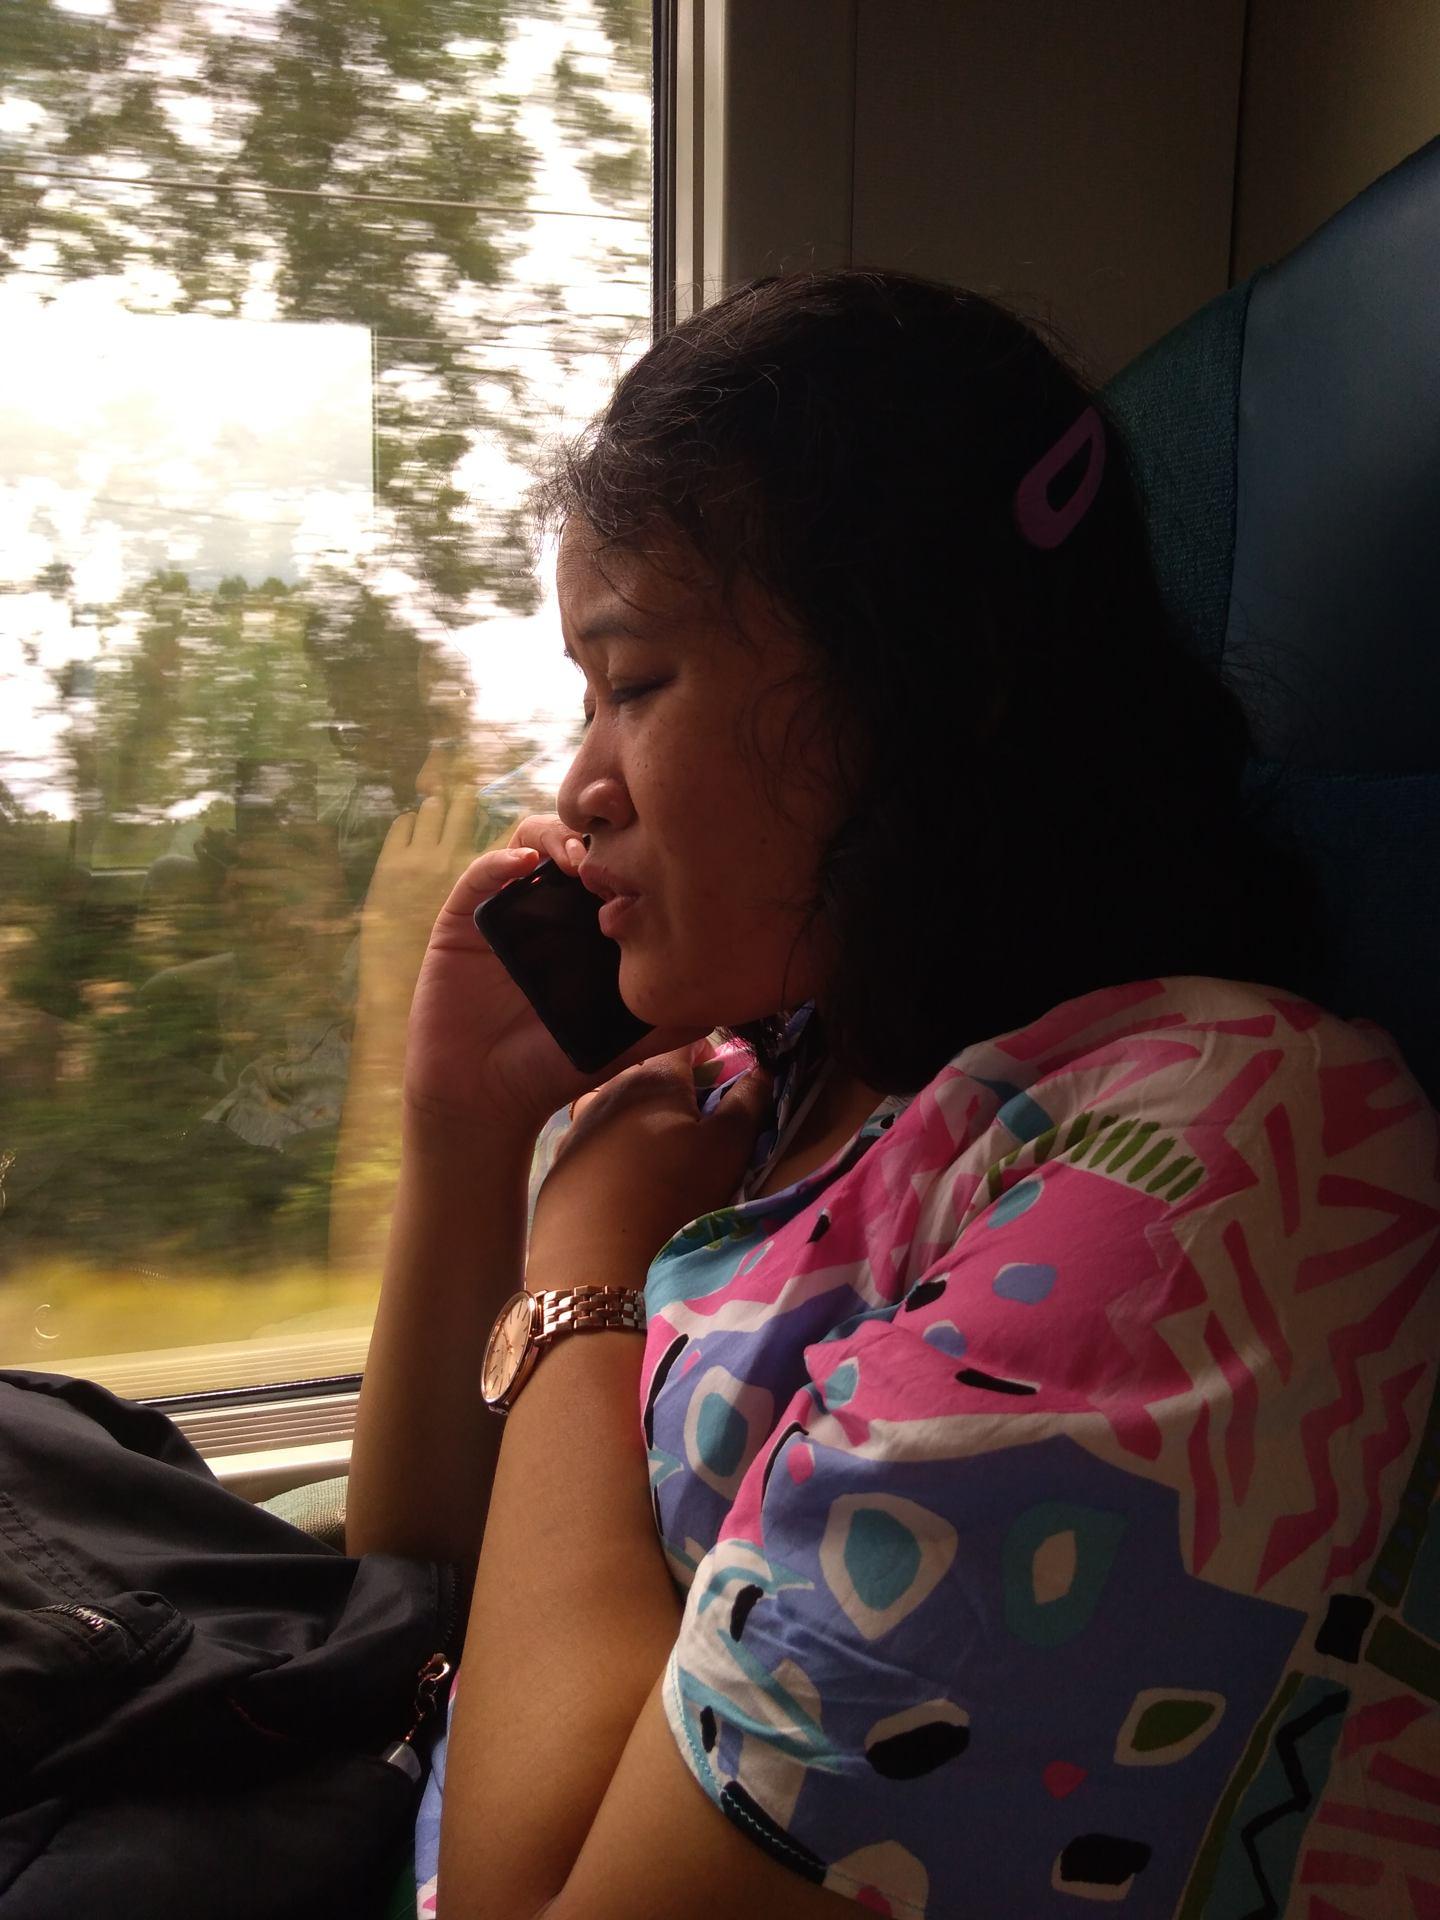 Always on the phone